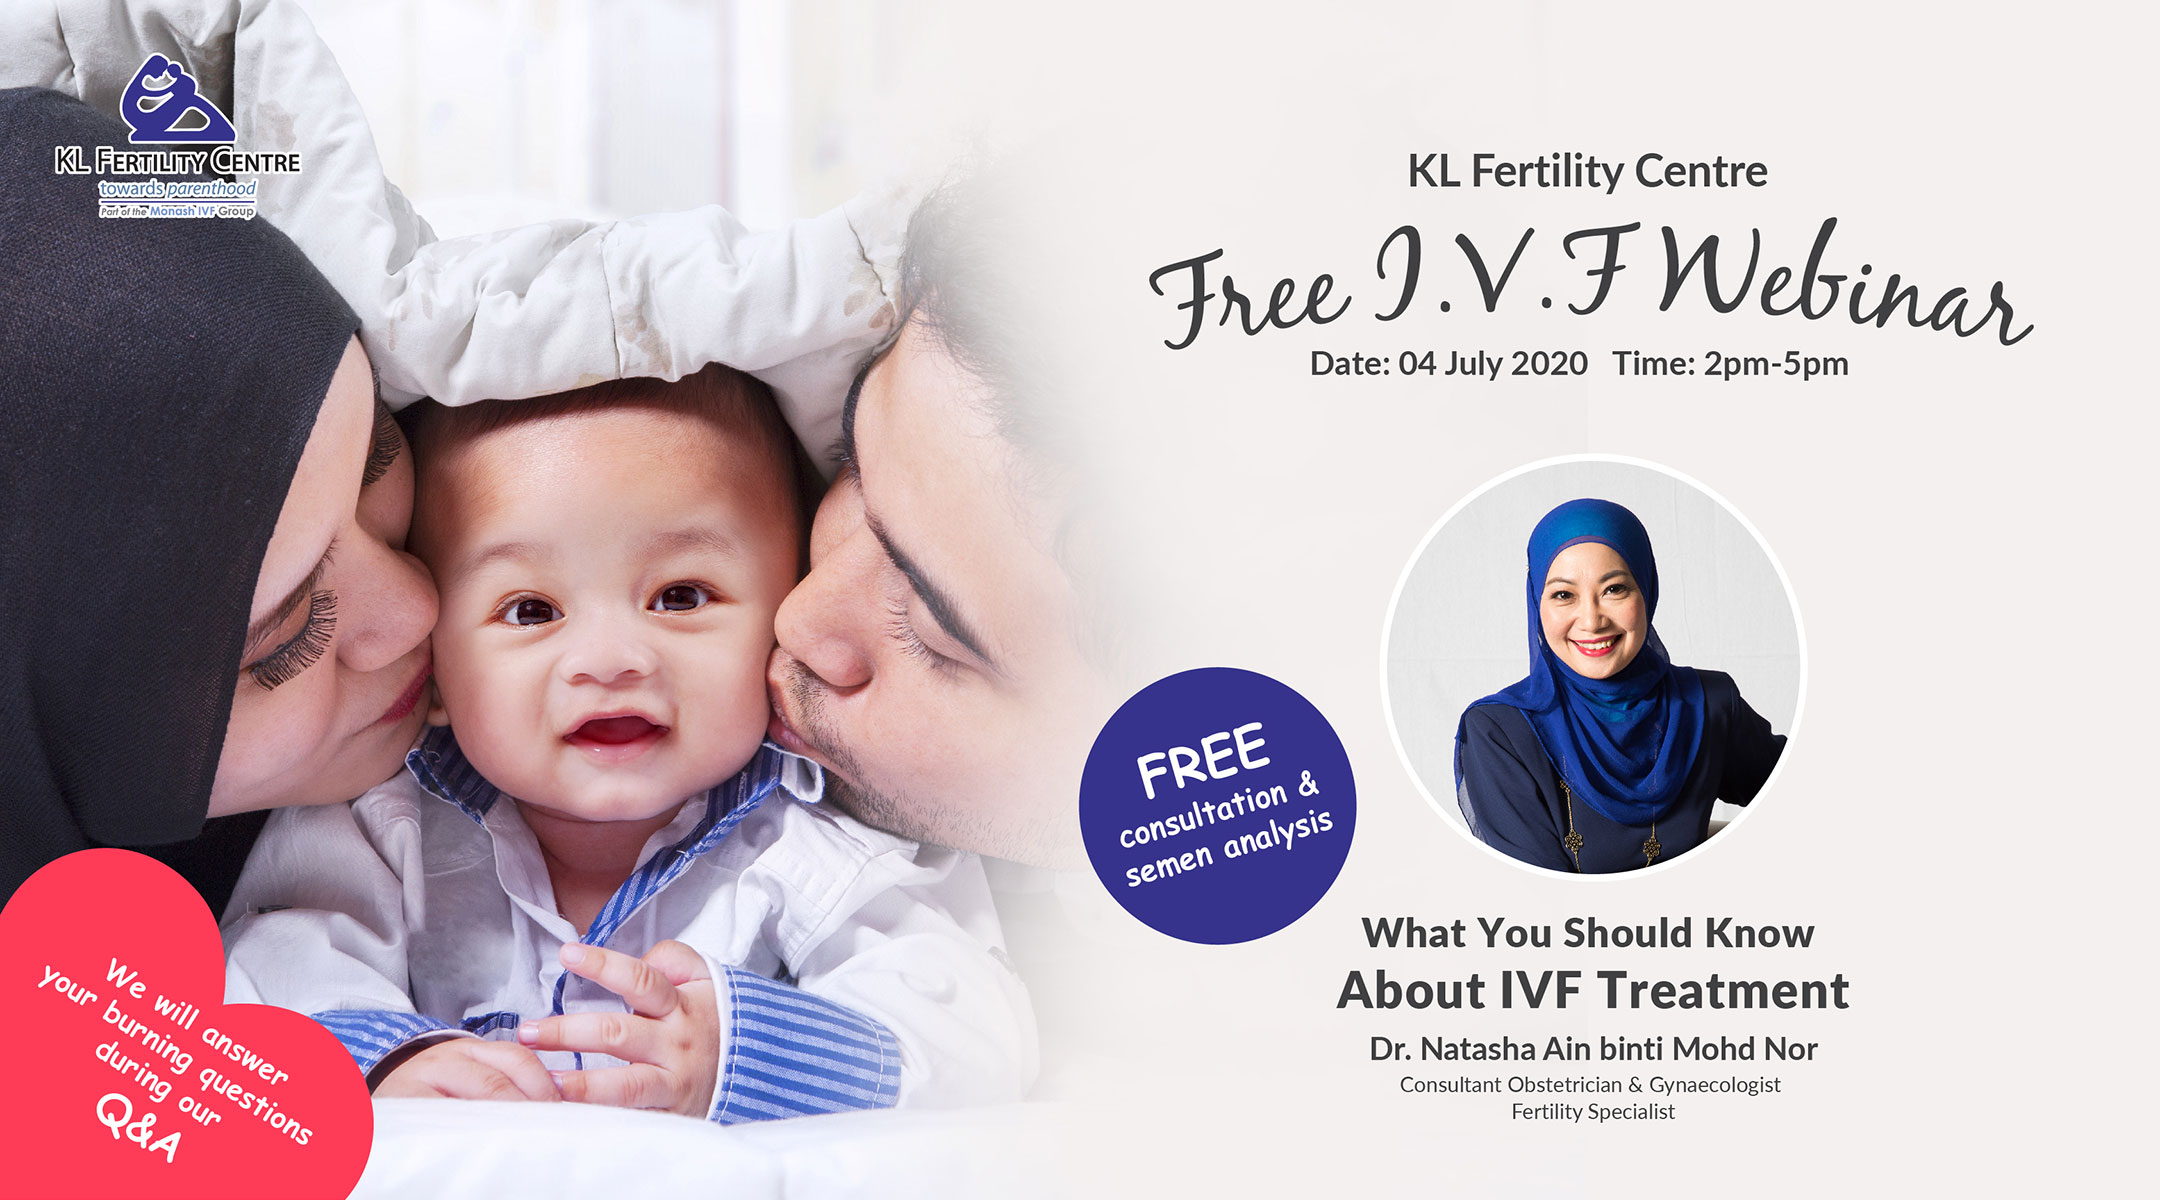 Free IVF Webinar 04 July 2020 - Dr. Natasha Ain binti Mohd Nor